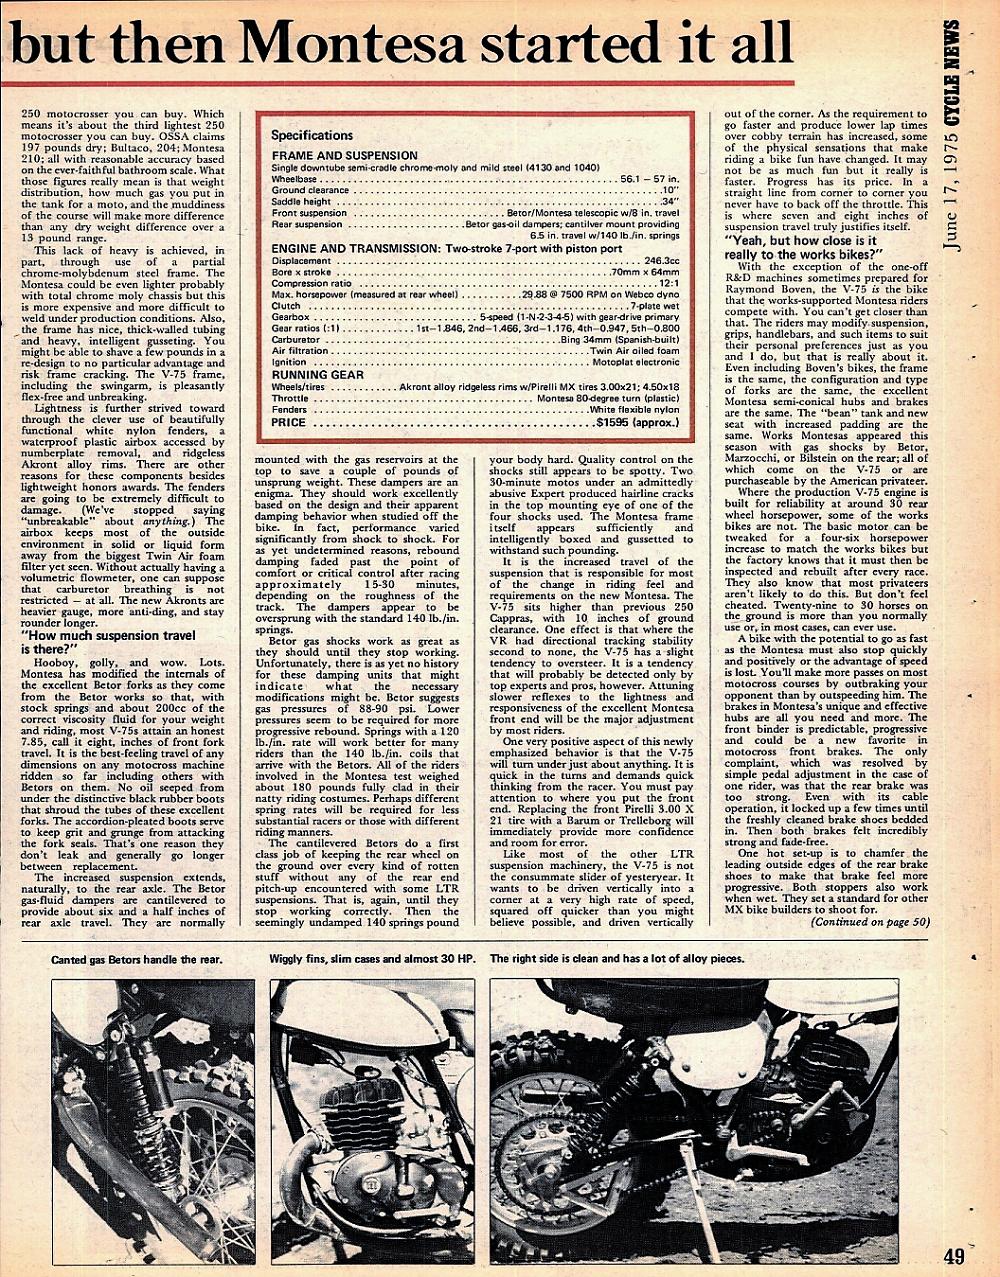 1975 Montesa Cappra V-75 road test. 2.jpg